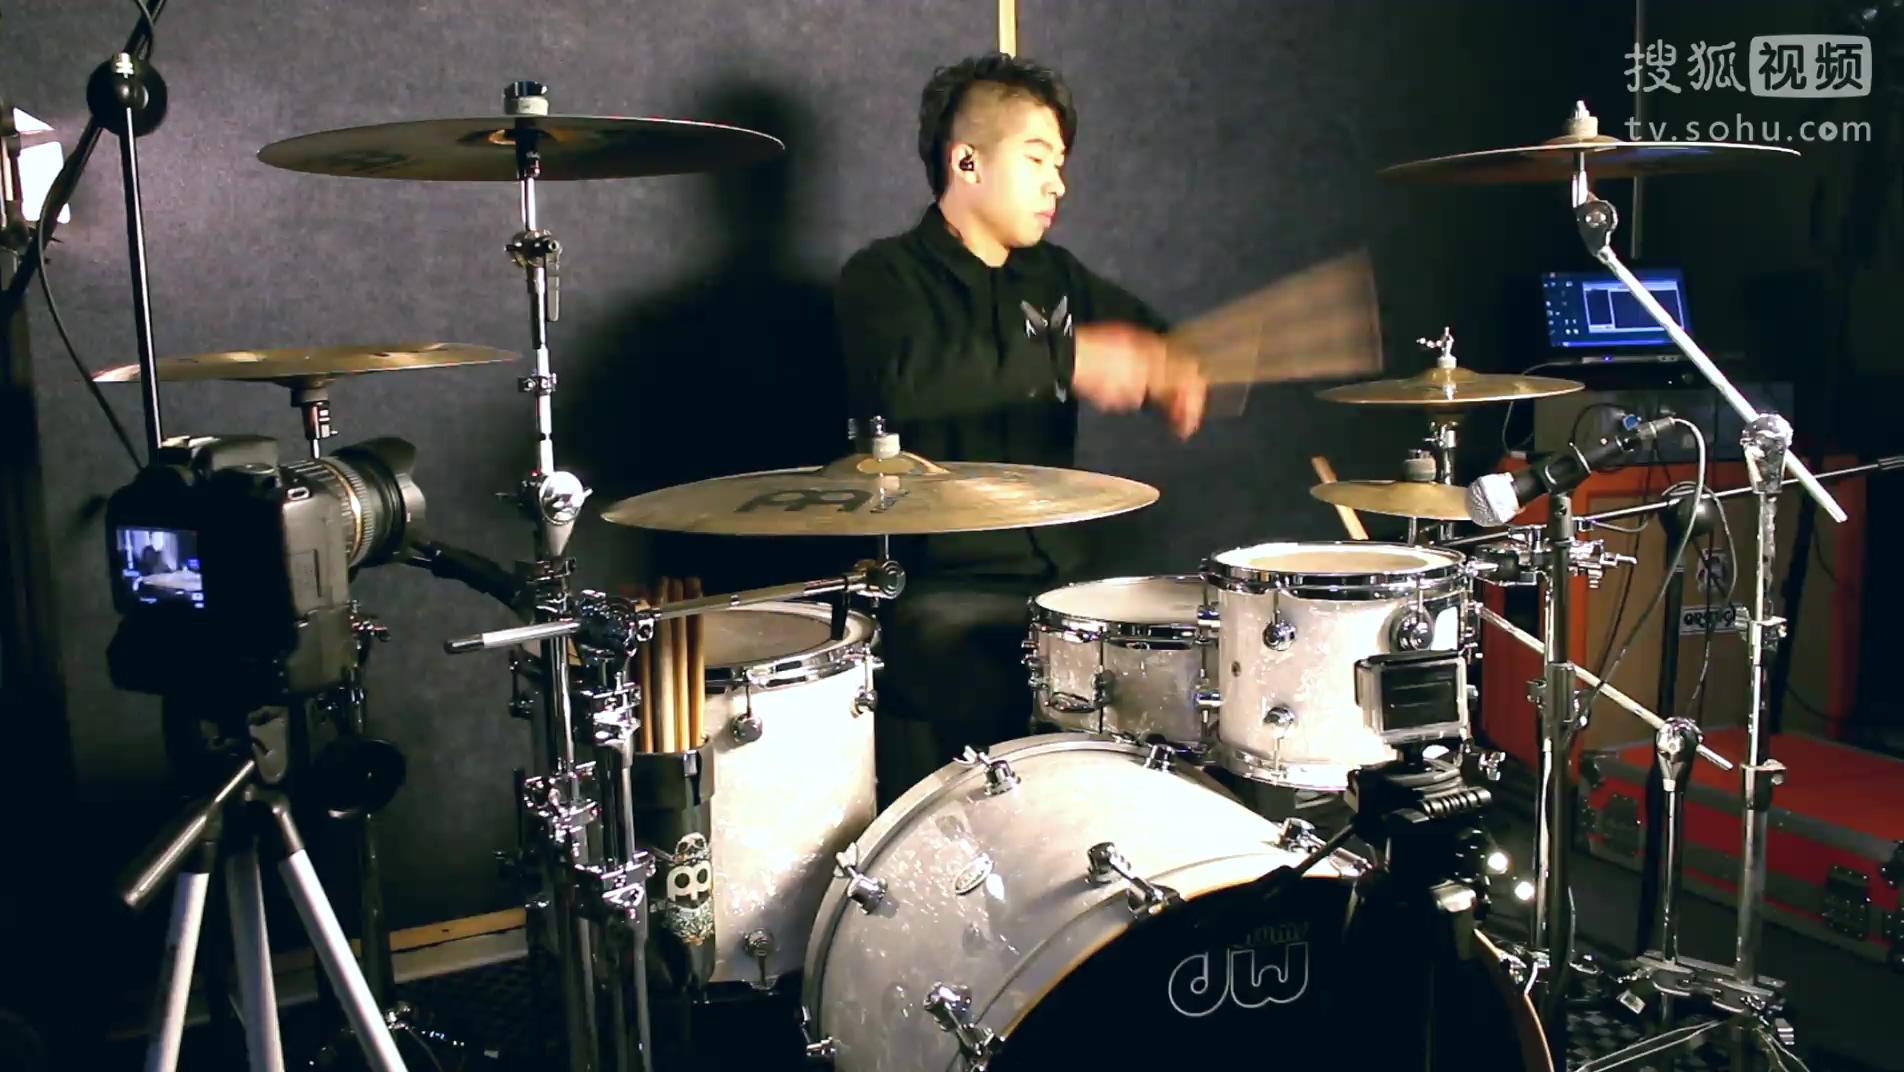 drum pads谱子bad boy